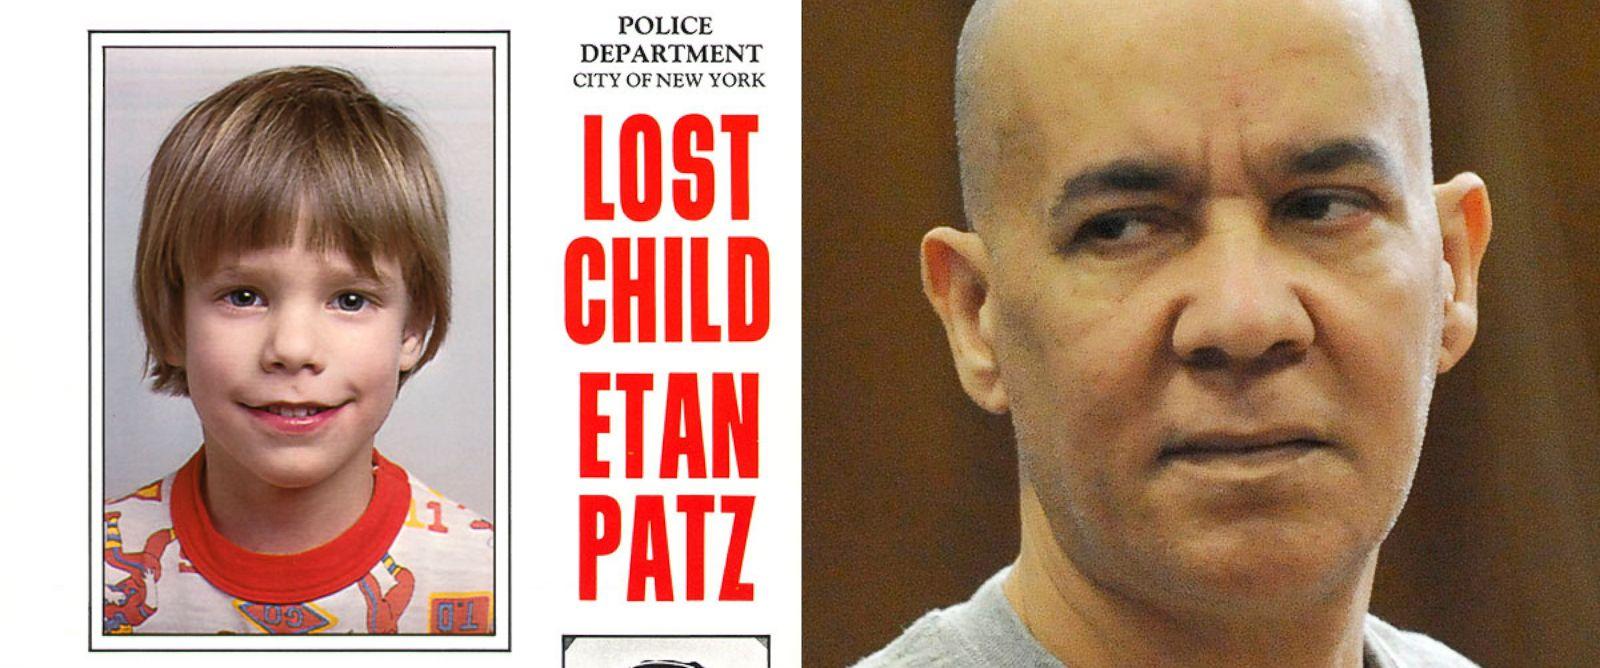 Arrest Made in the Etan Patz Missing Child Case 33 Years Later Arrest Made in the Etan Patz Missing Child Case 33 Years Later new picture